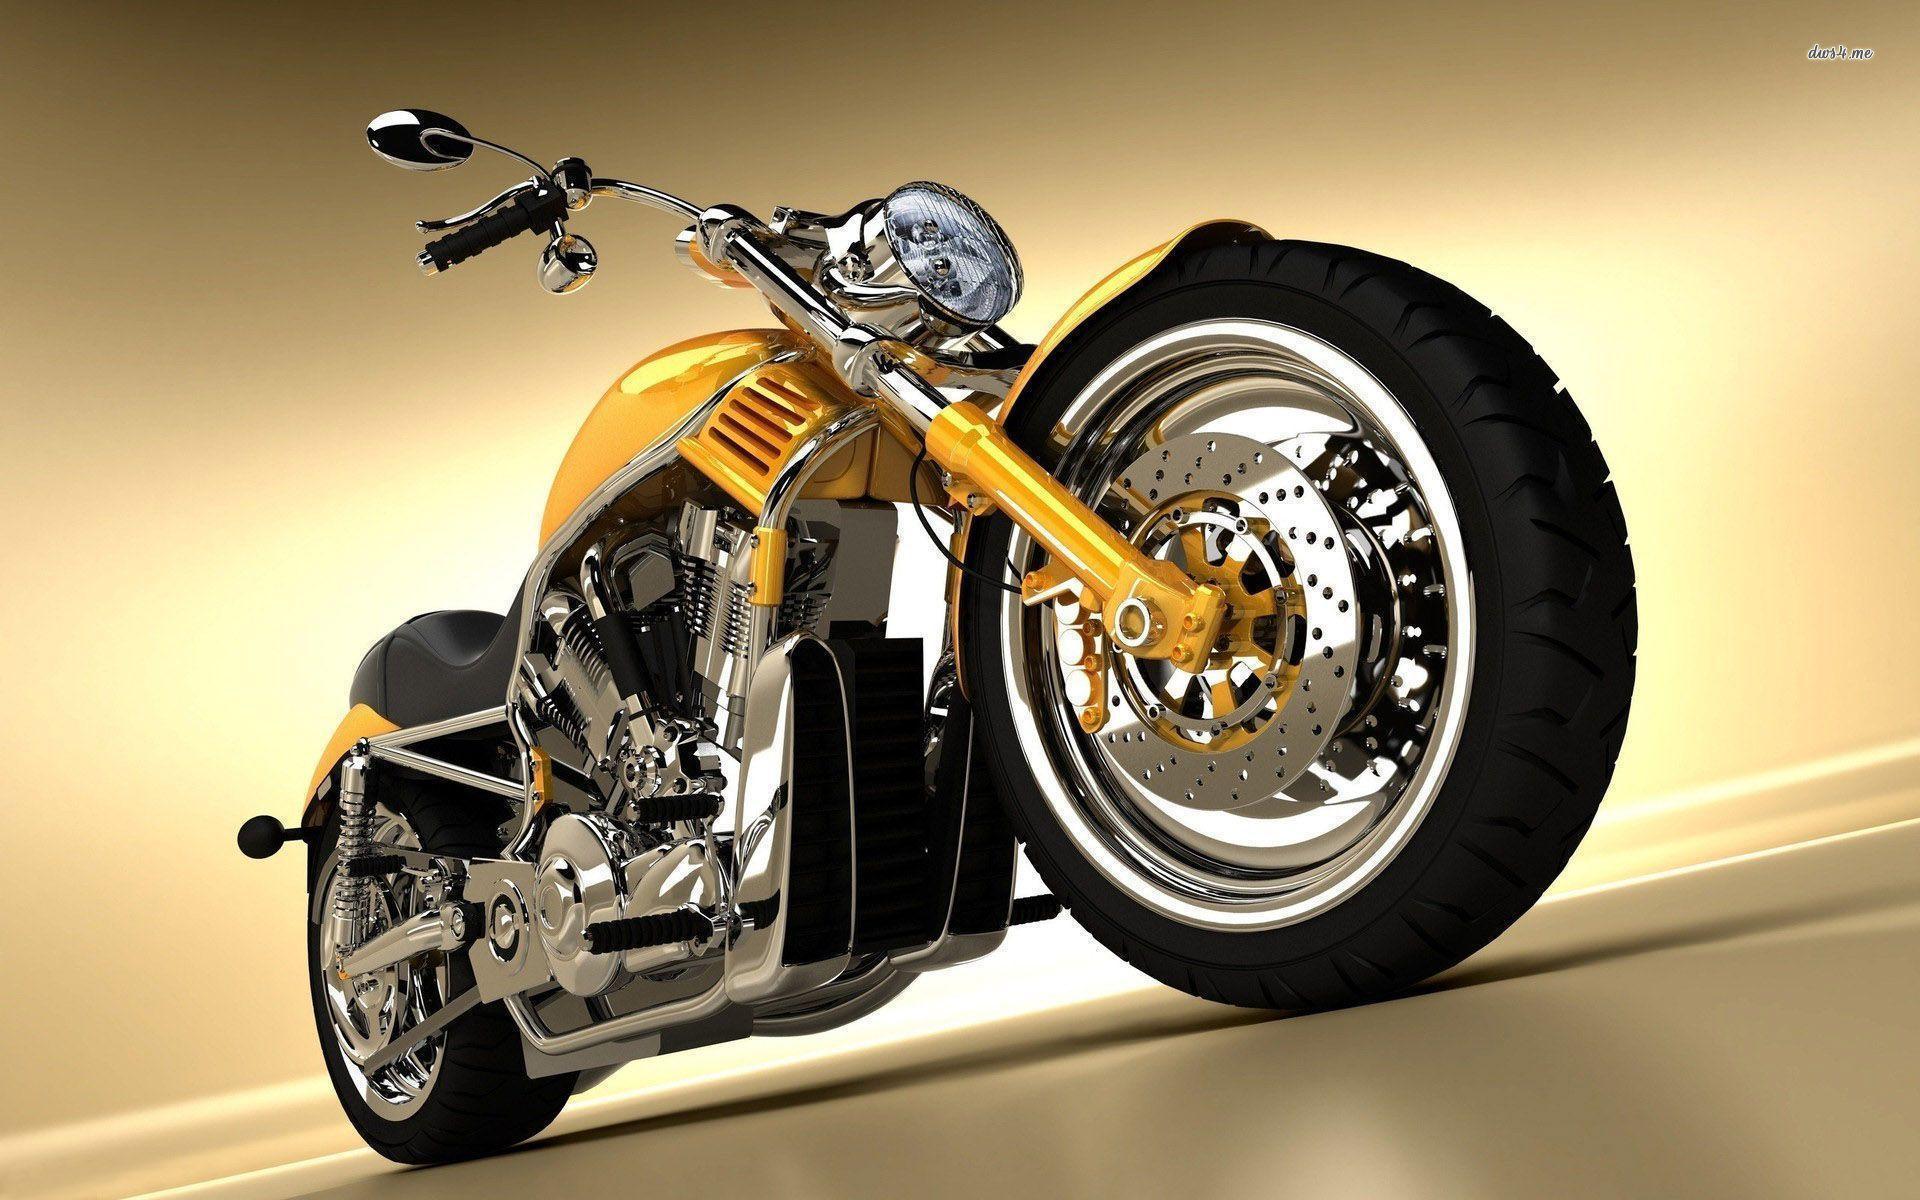 Harley Davidson Motorcycles HD Wallpaper - DOWNLOAD HD WALLPAPERS